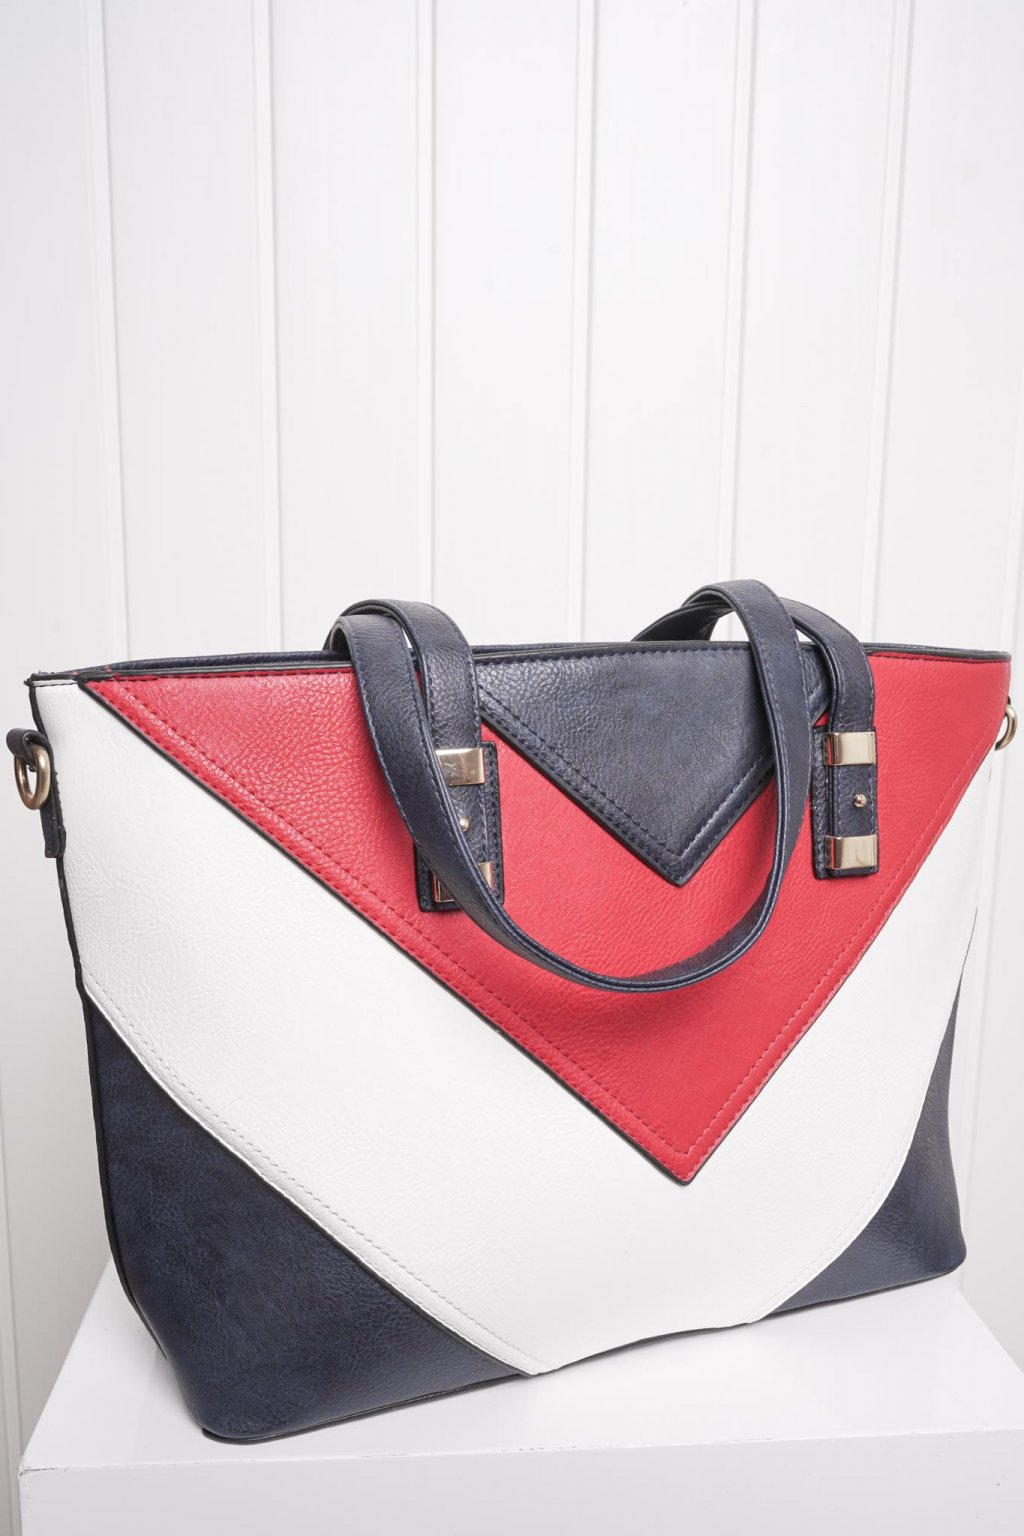 Kabelka, ruksak, dobrá cena, čierna kabelka, čierny ruksak, basic, kabelky, ruksaky 115